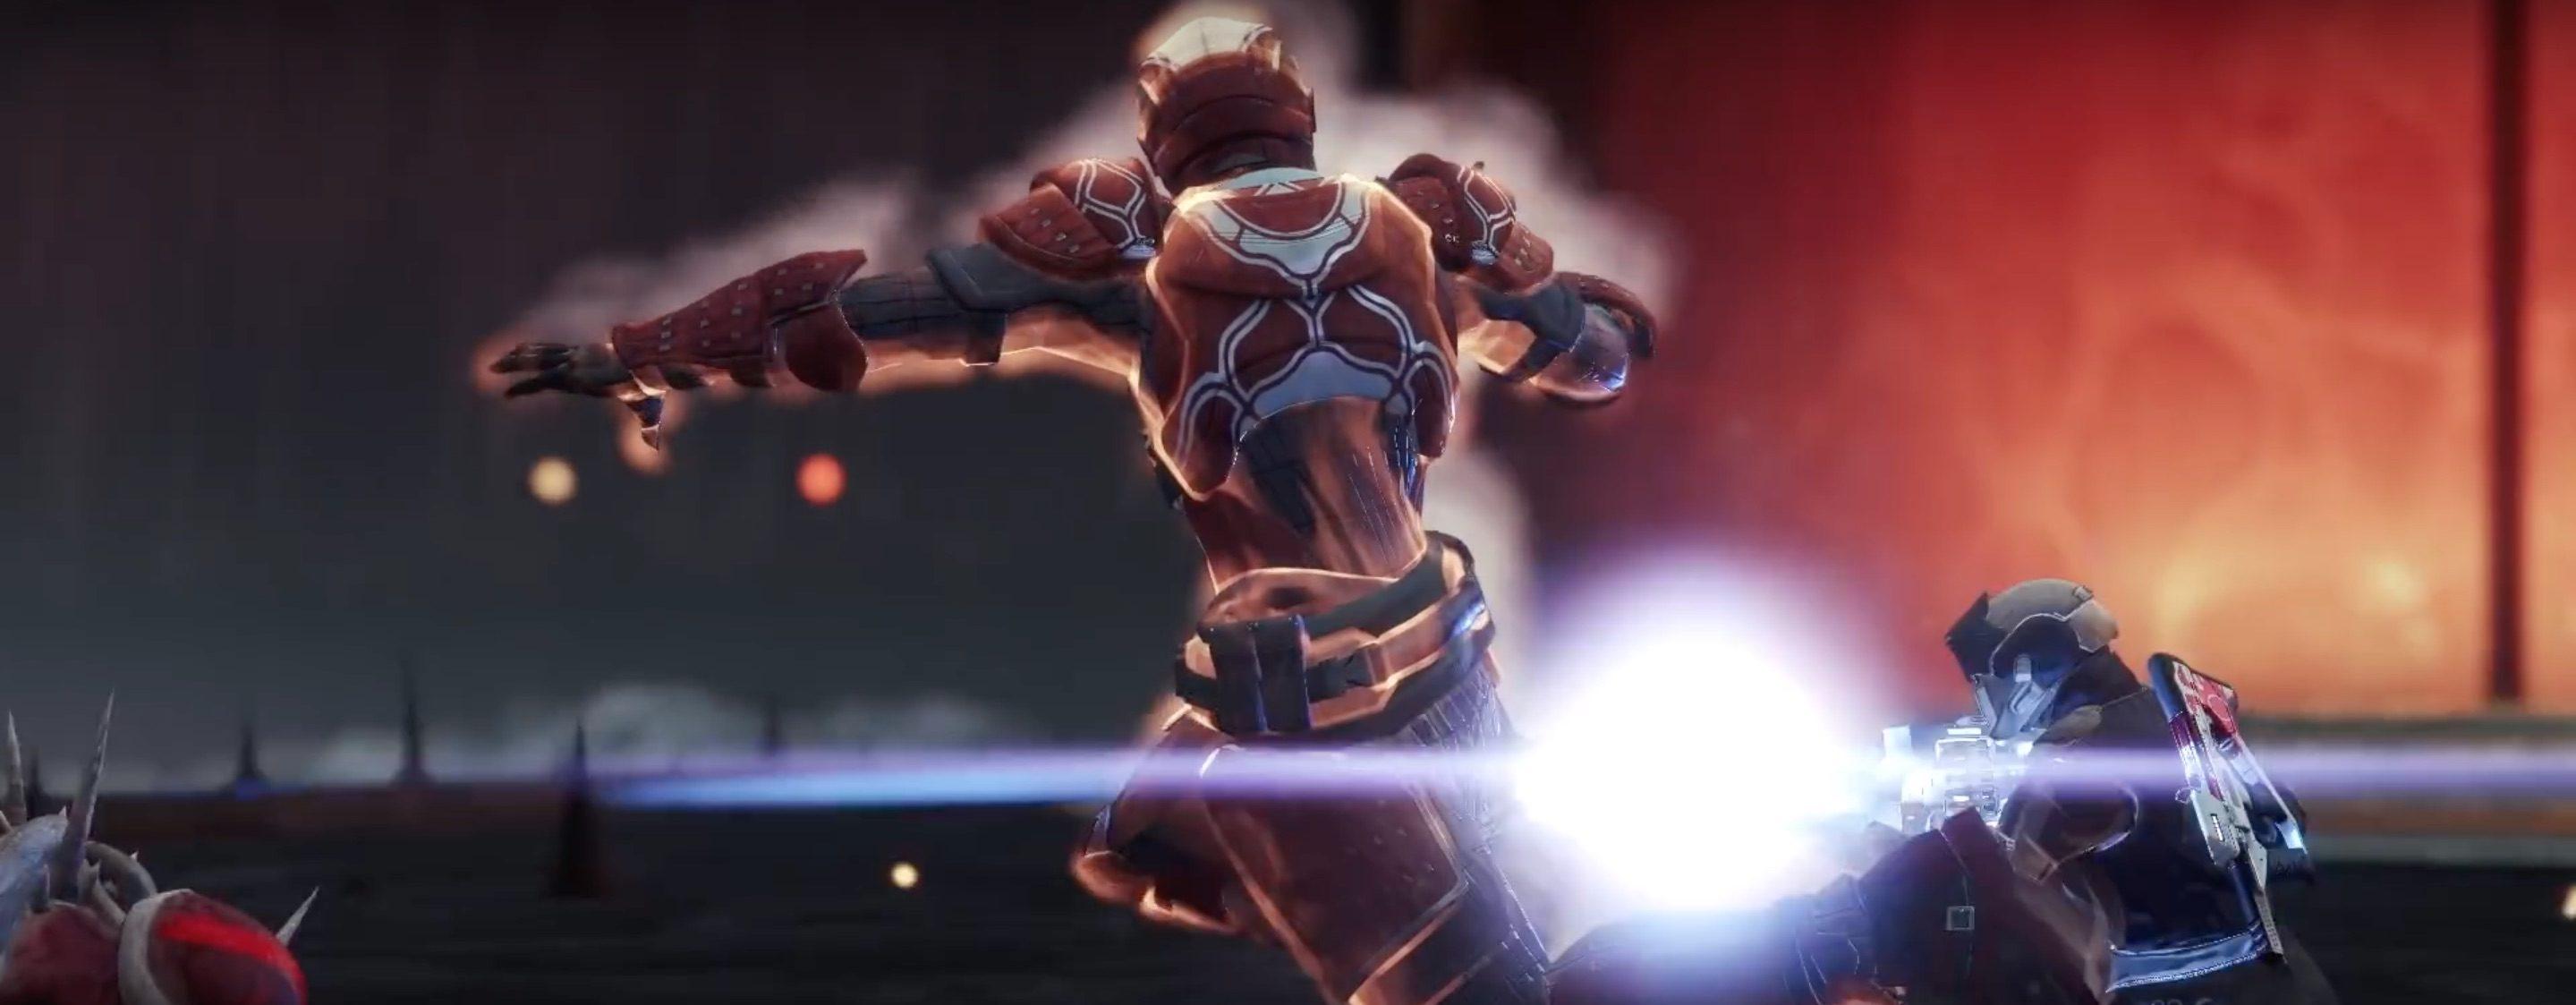 Destiny 2: Neuer Ärger mit den Finishern – Nächster dicker Glitch entdeckt